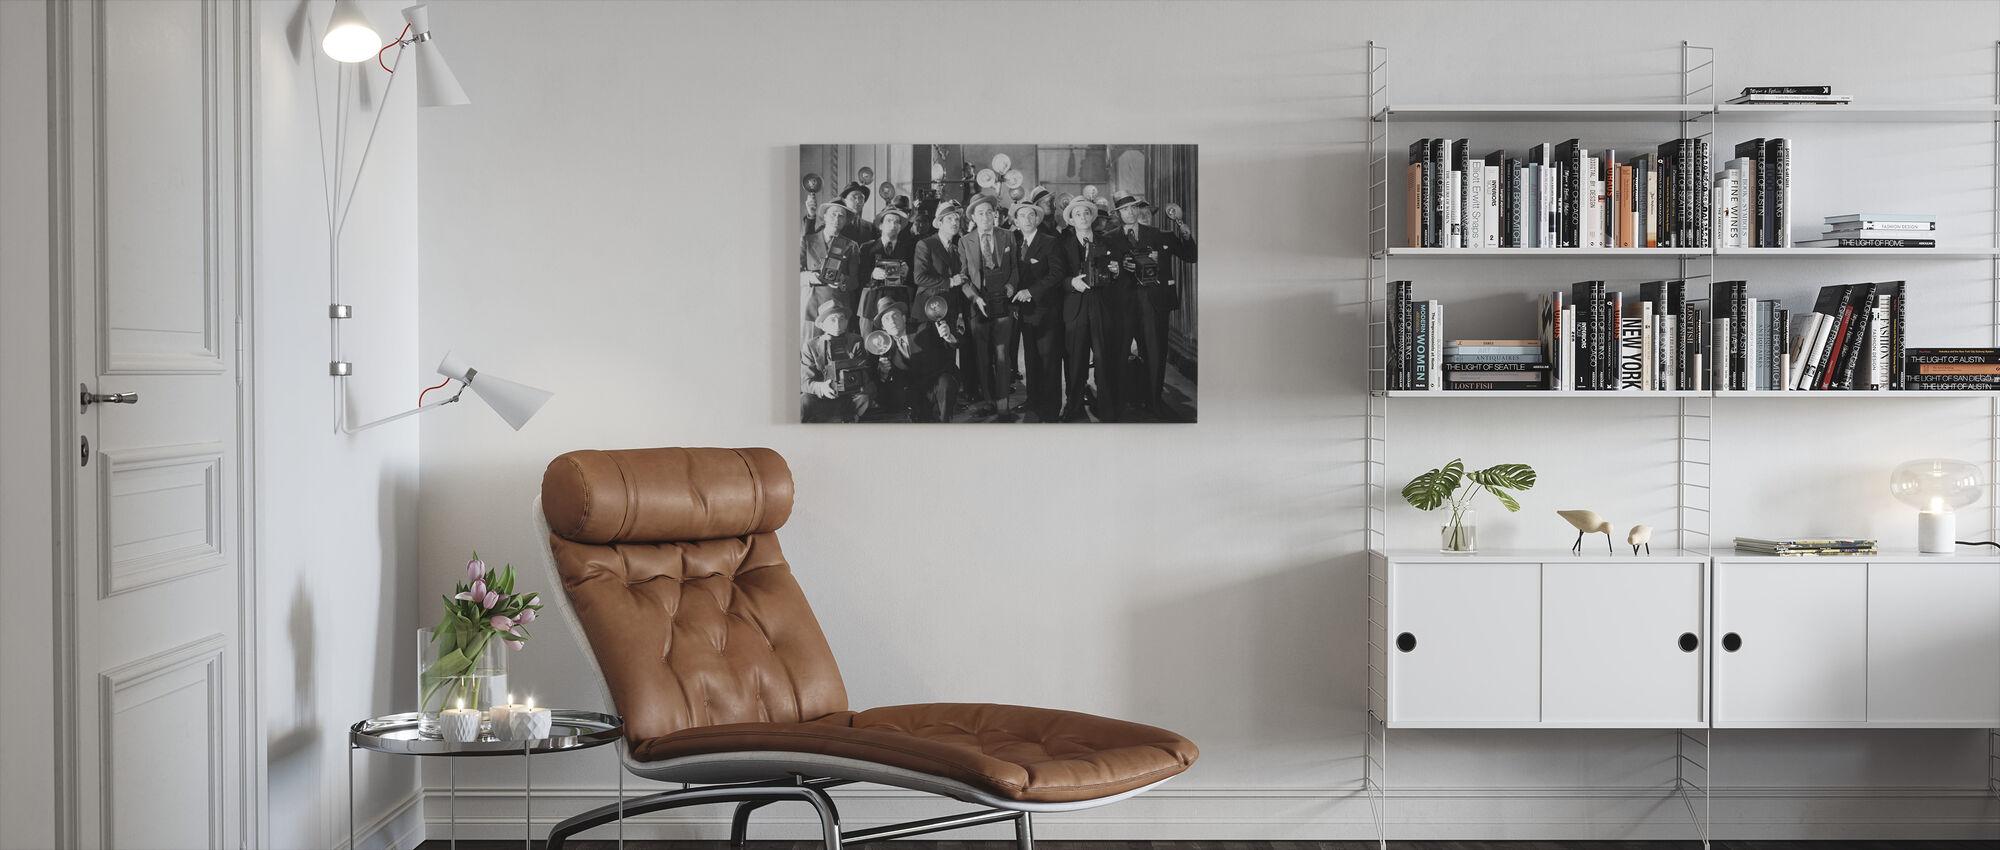 Paparazzi verwarring - Canvas print - Woonkamer